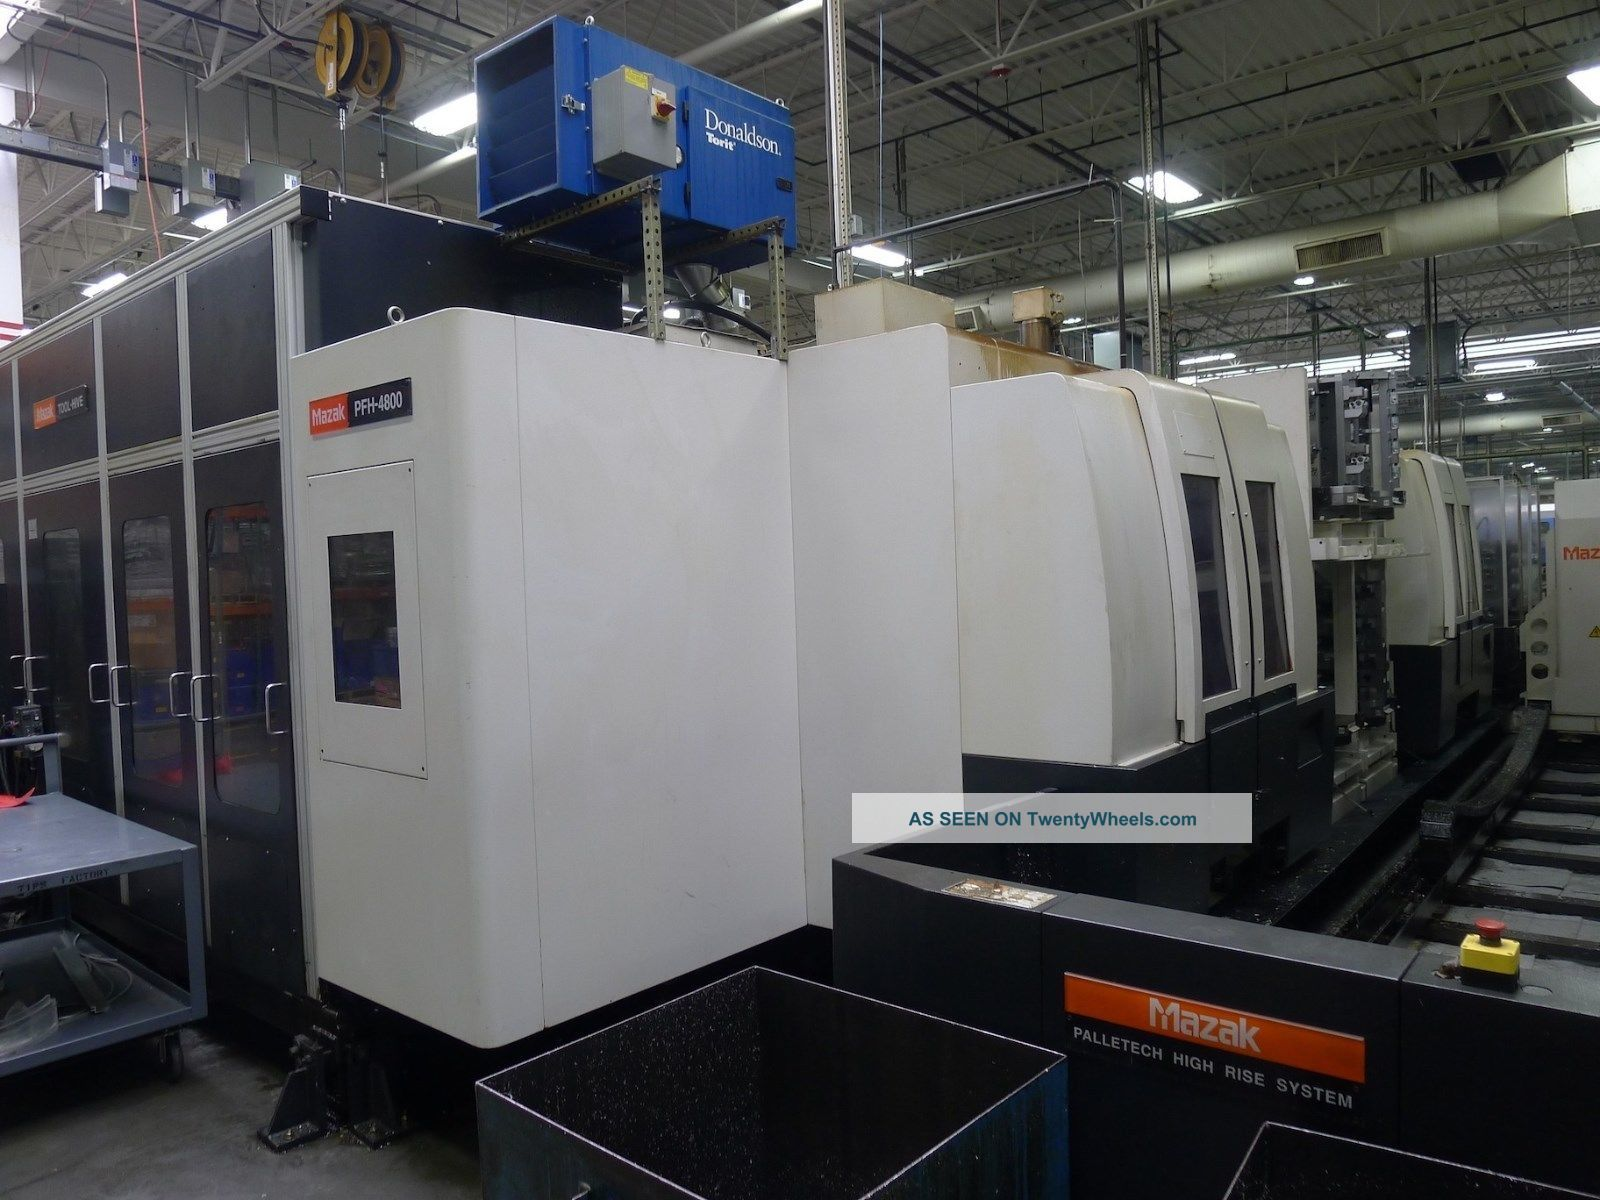 Mazak Pfh - 4800 Pallet - Tech System (2) Machines 32 Pallets,  Renishaw Probing Milling Machines photo